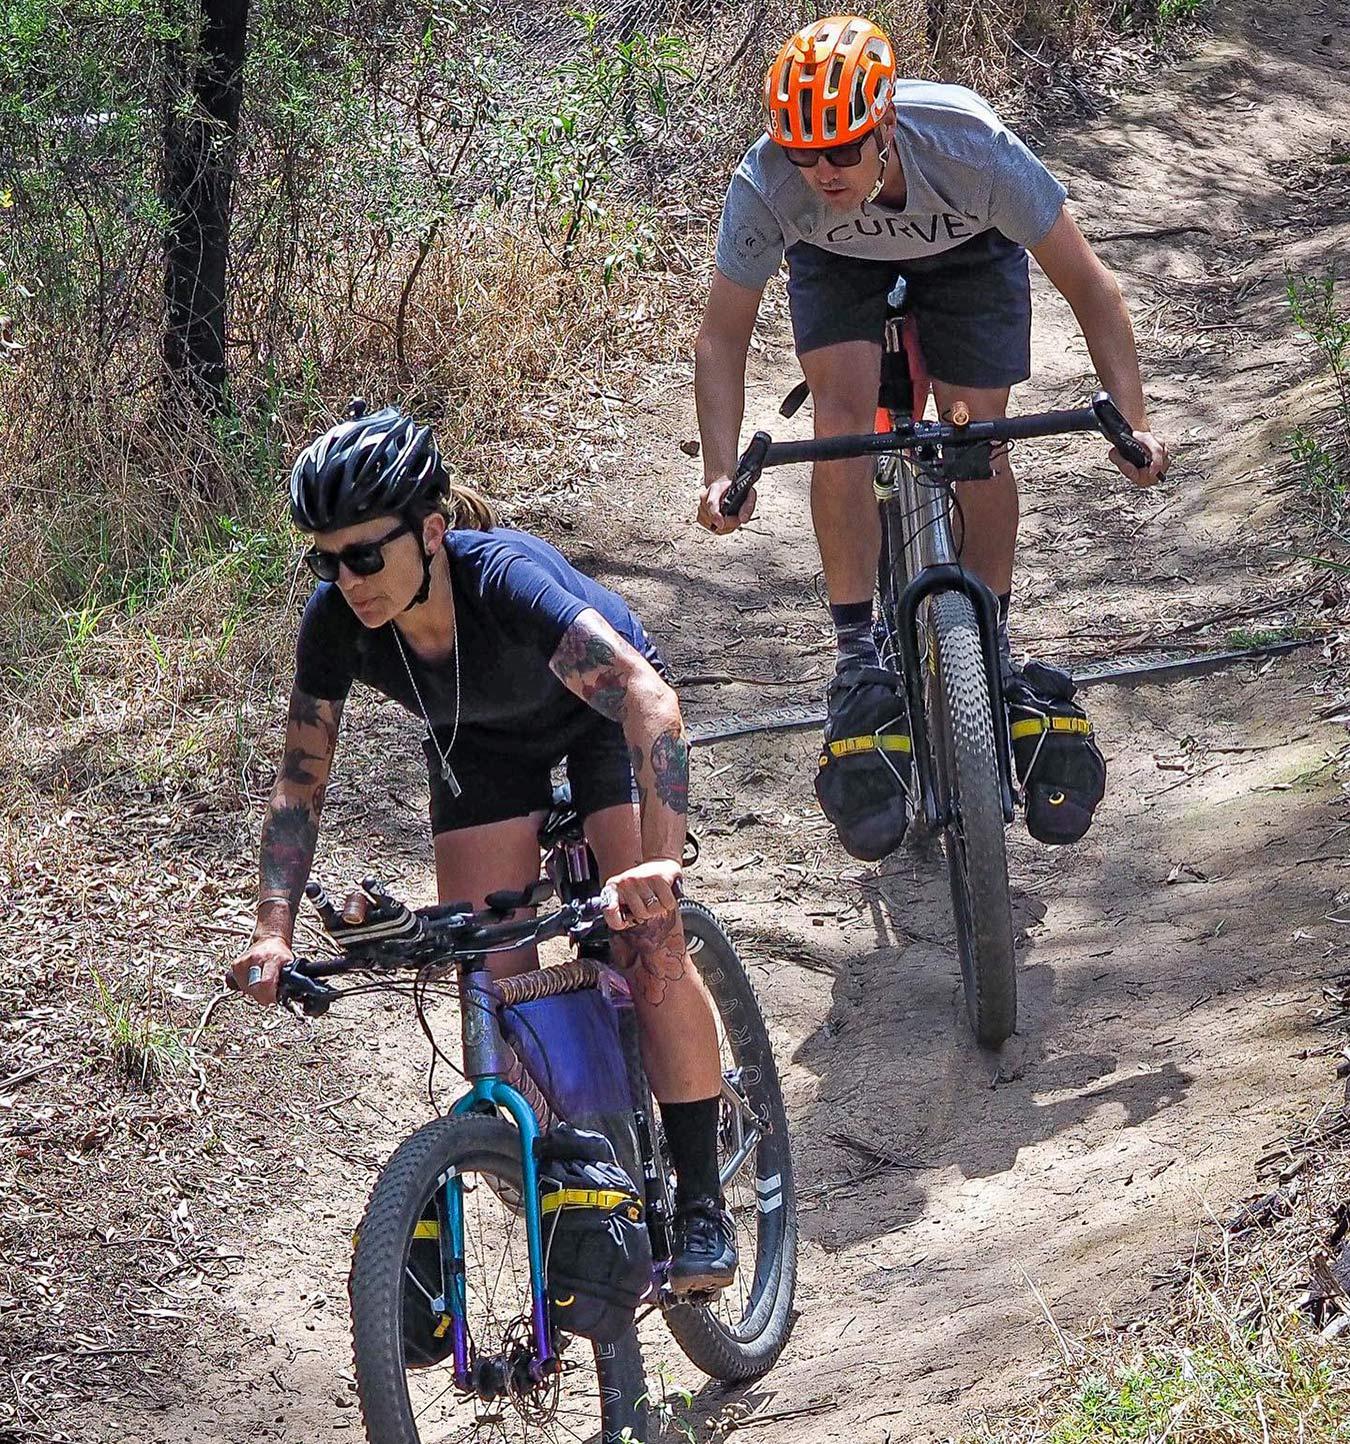 Curve Remlaw gravel adventure flat bar, forwardswept & backswept MTB bikepacking bar,riding off-road